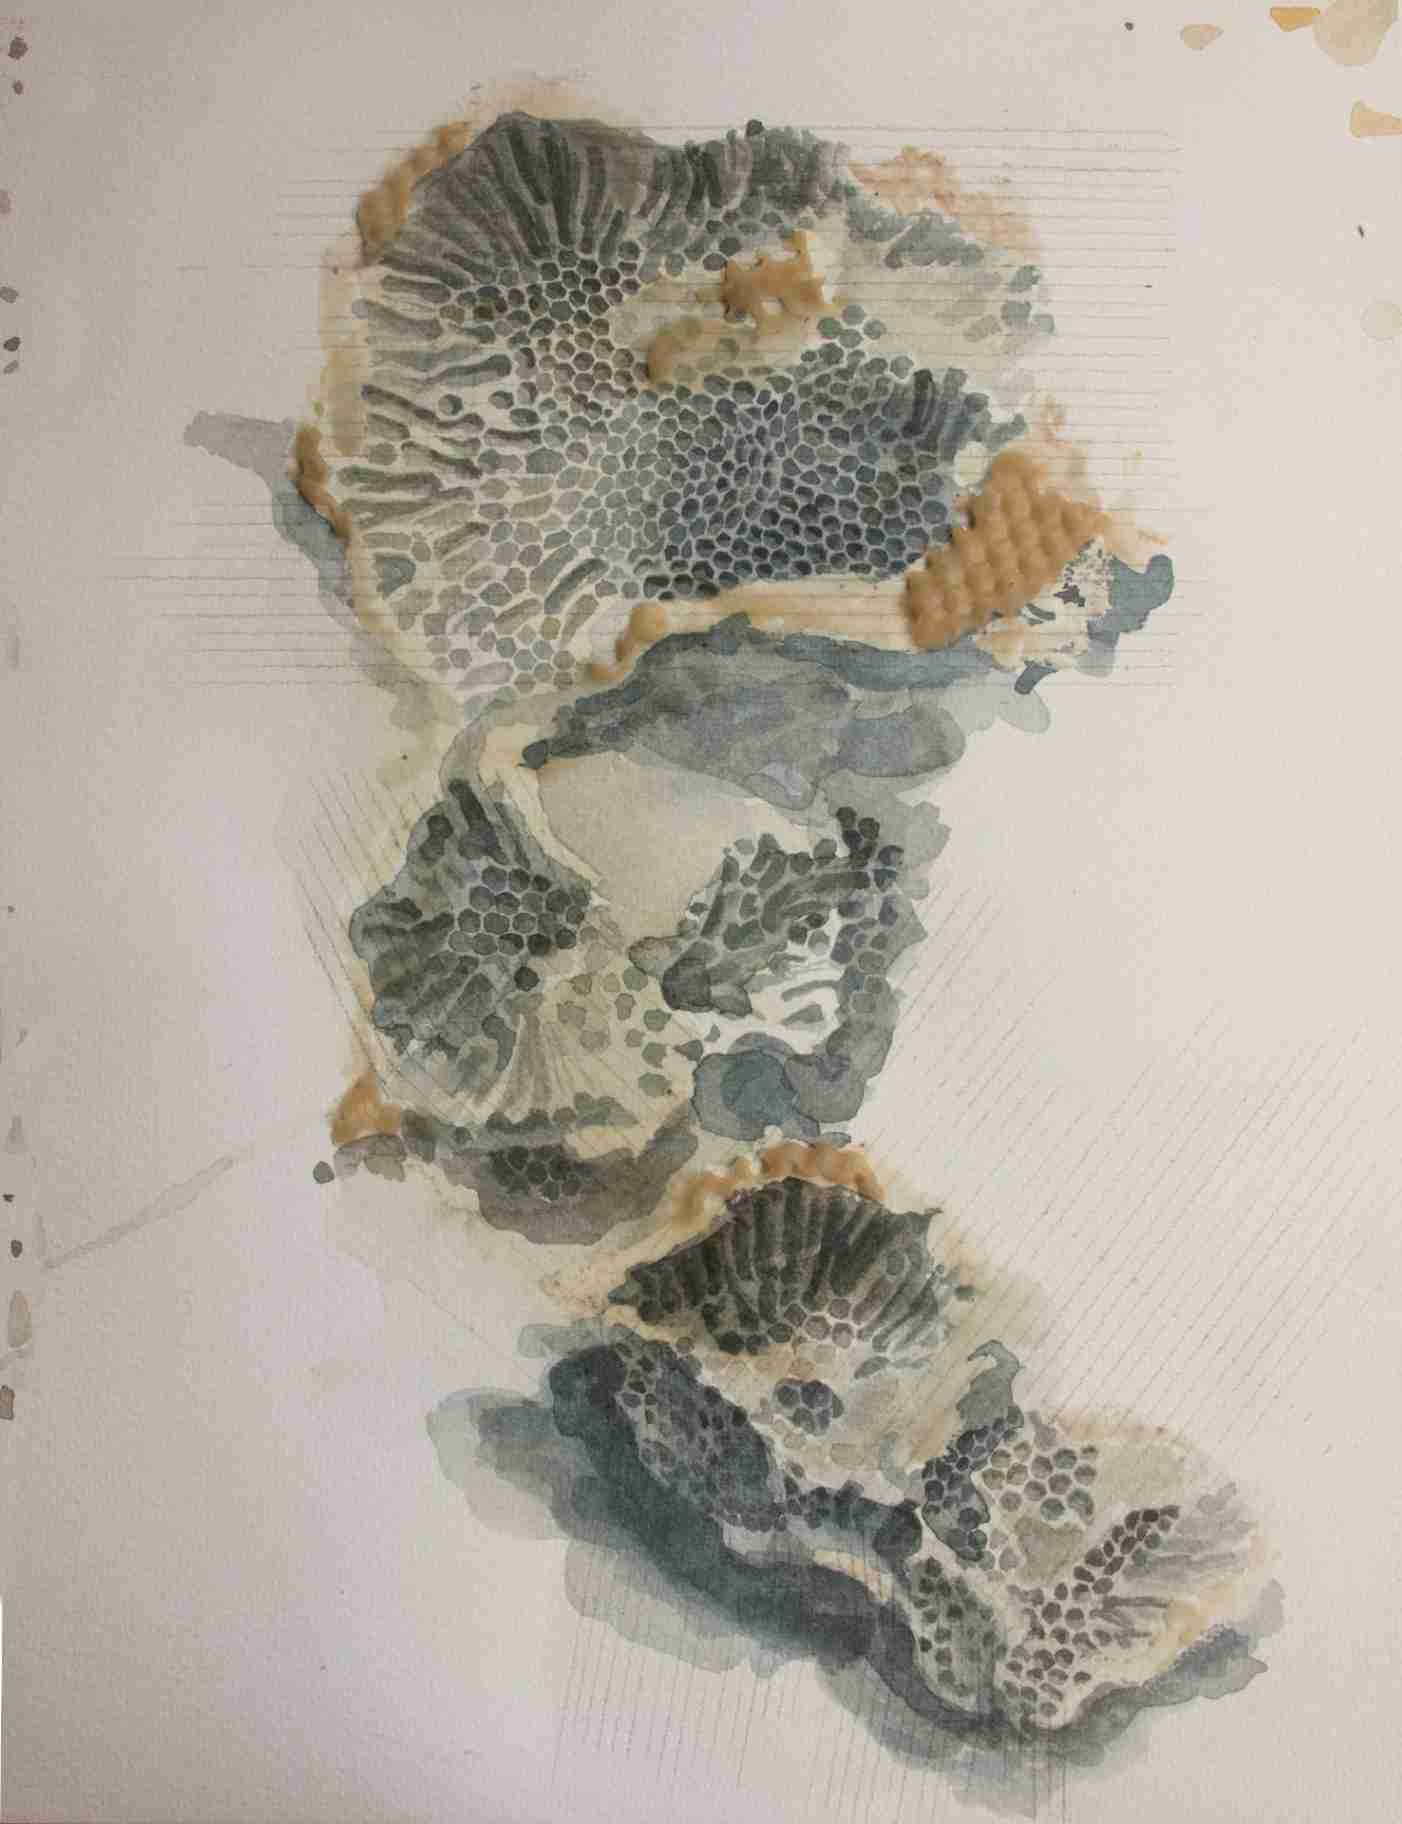 Obra: Organismo fosil #17